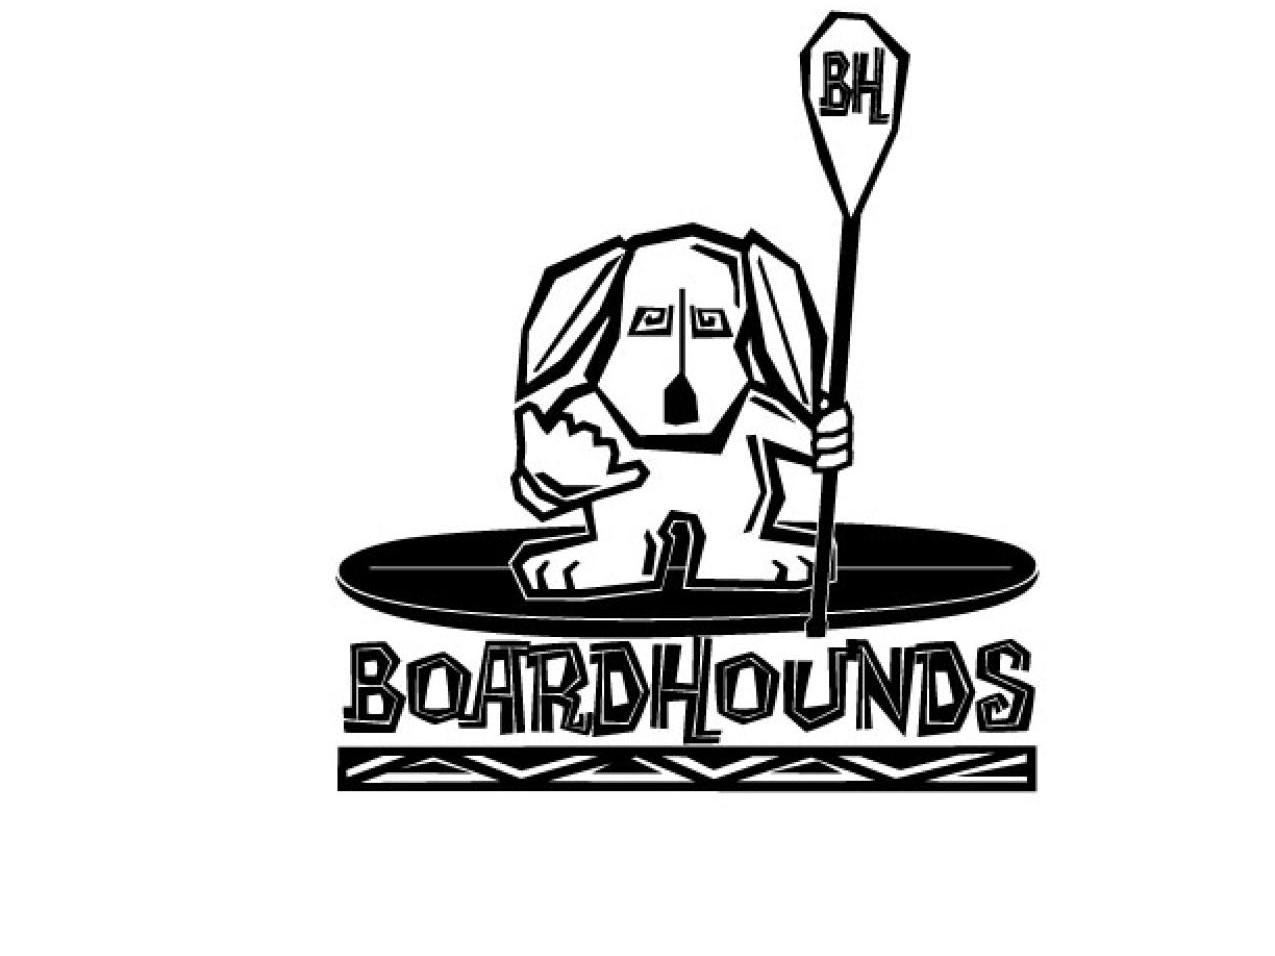 Board Hounds